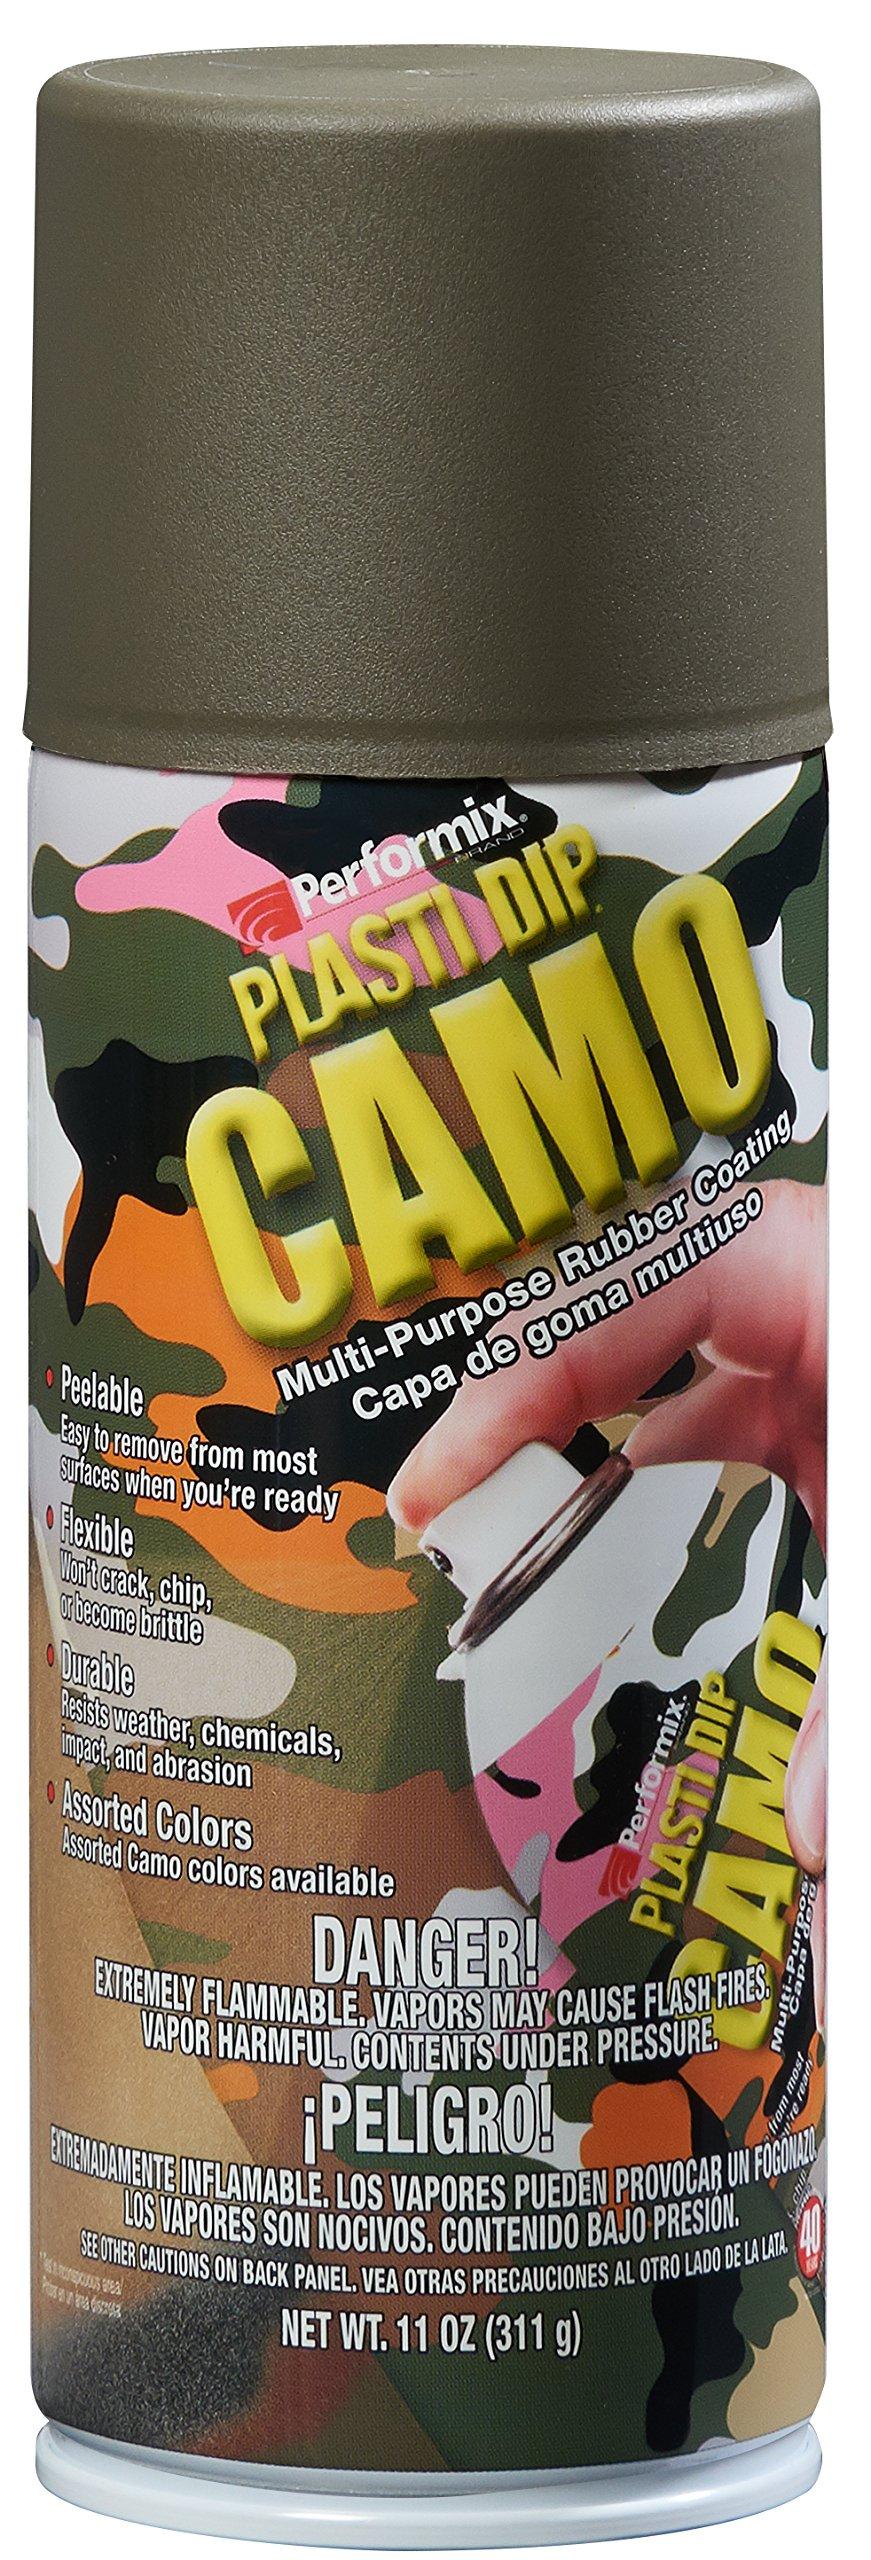 Plasti Dip Performix (11217-6-6PK) Green Camo Spray - 11 oz. Aerosol, (Pack of 6)